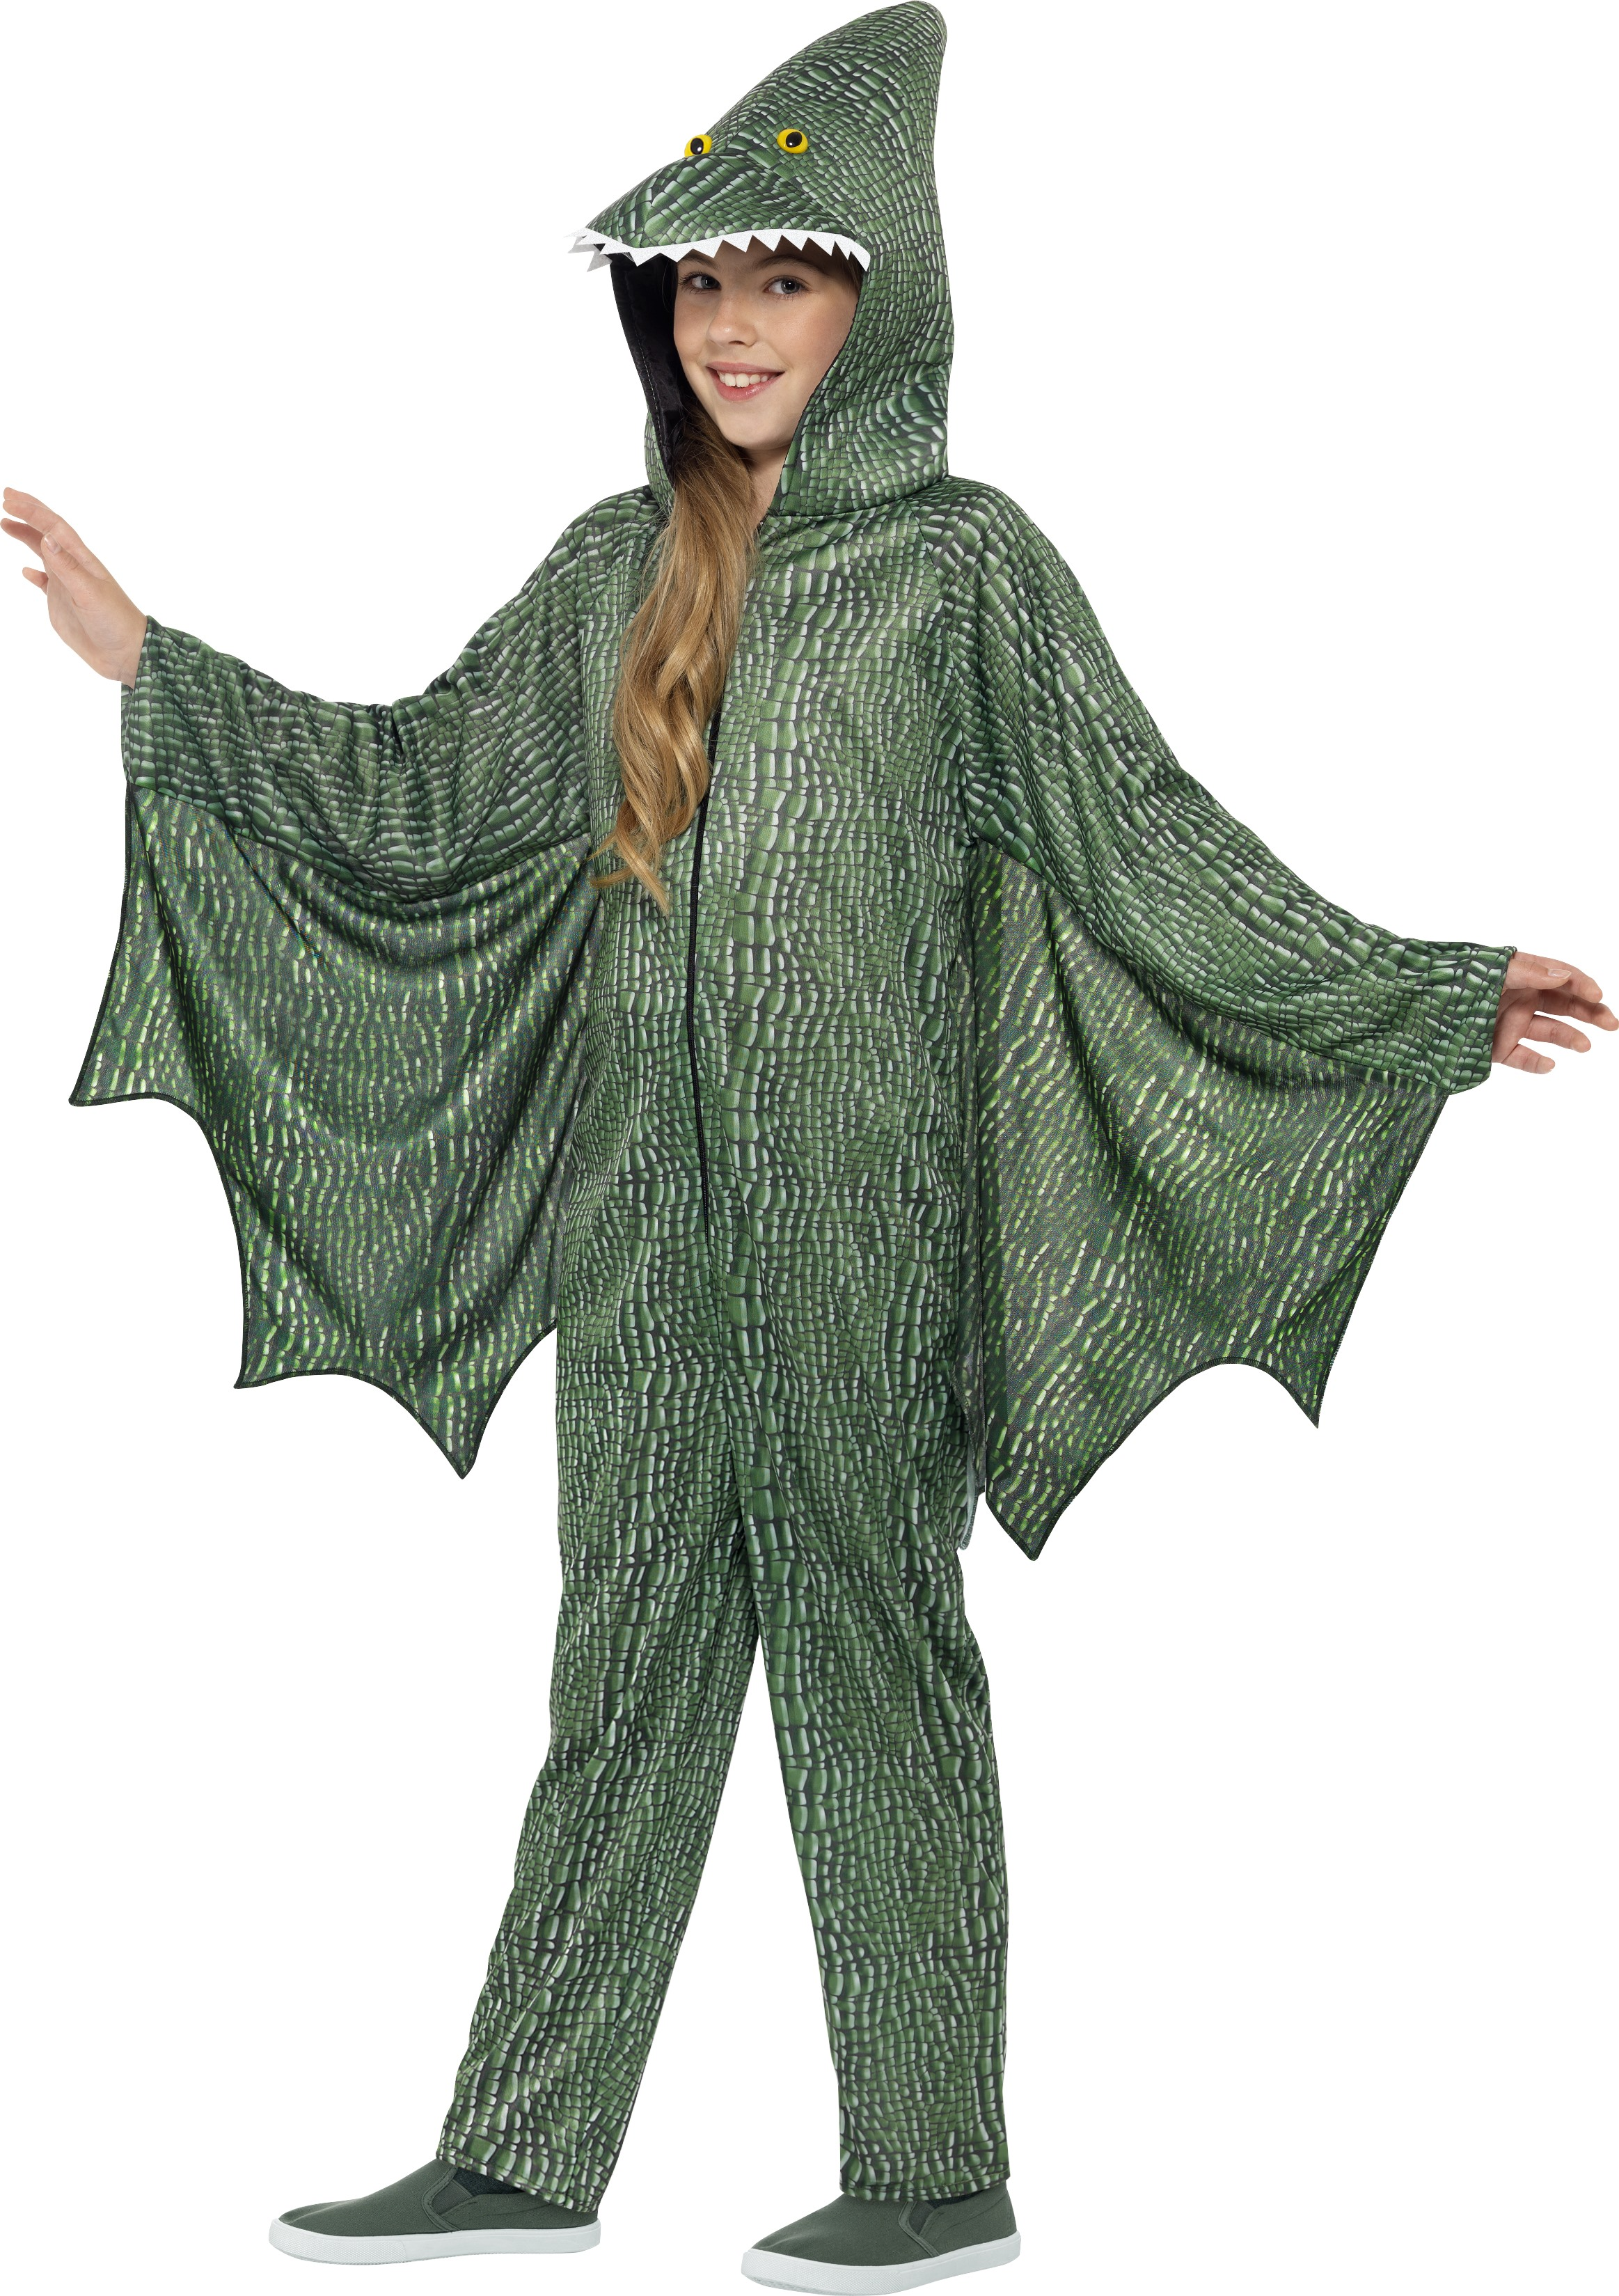 pterodactyl dinosaur kids costume girl 39 s world book day fancy dress costumes mega fancy dress. Black Bedroom Furniture Sets. Home Design Ideas